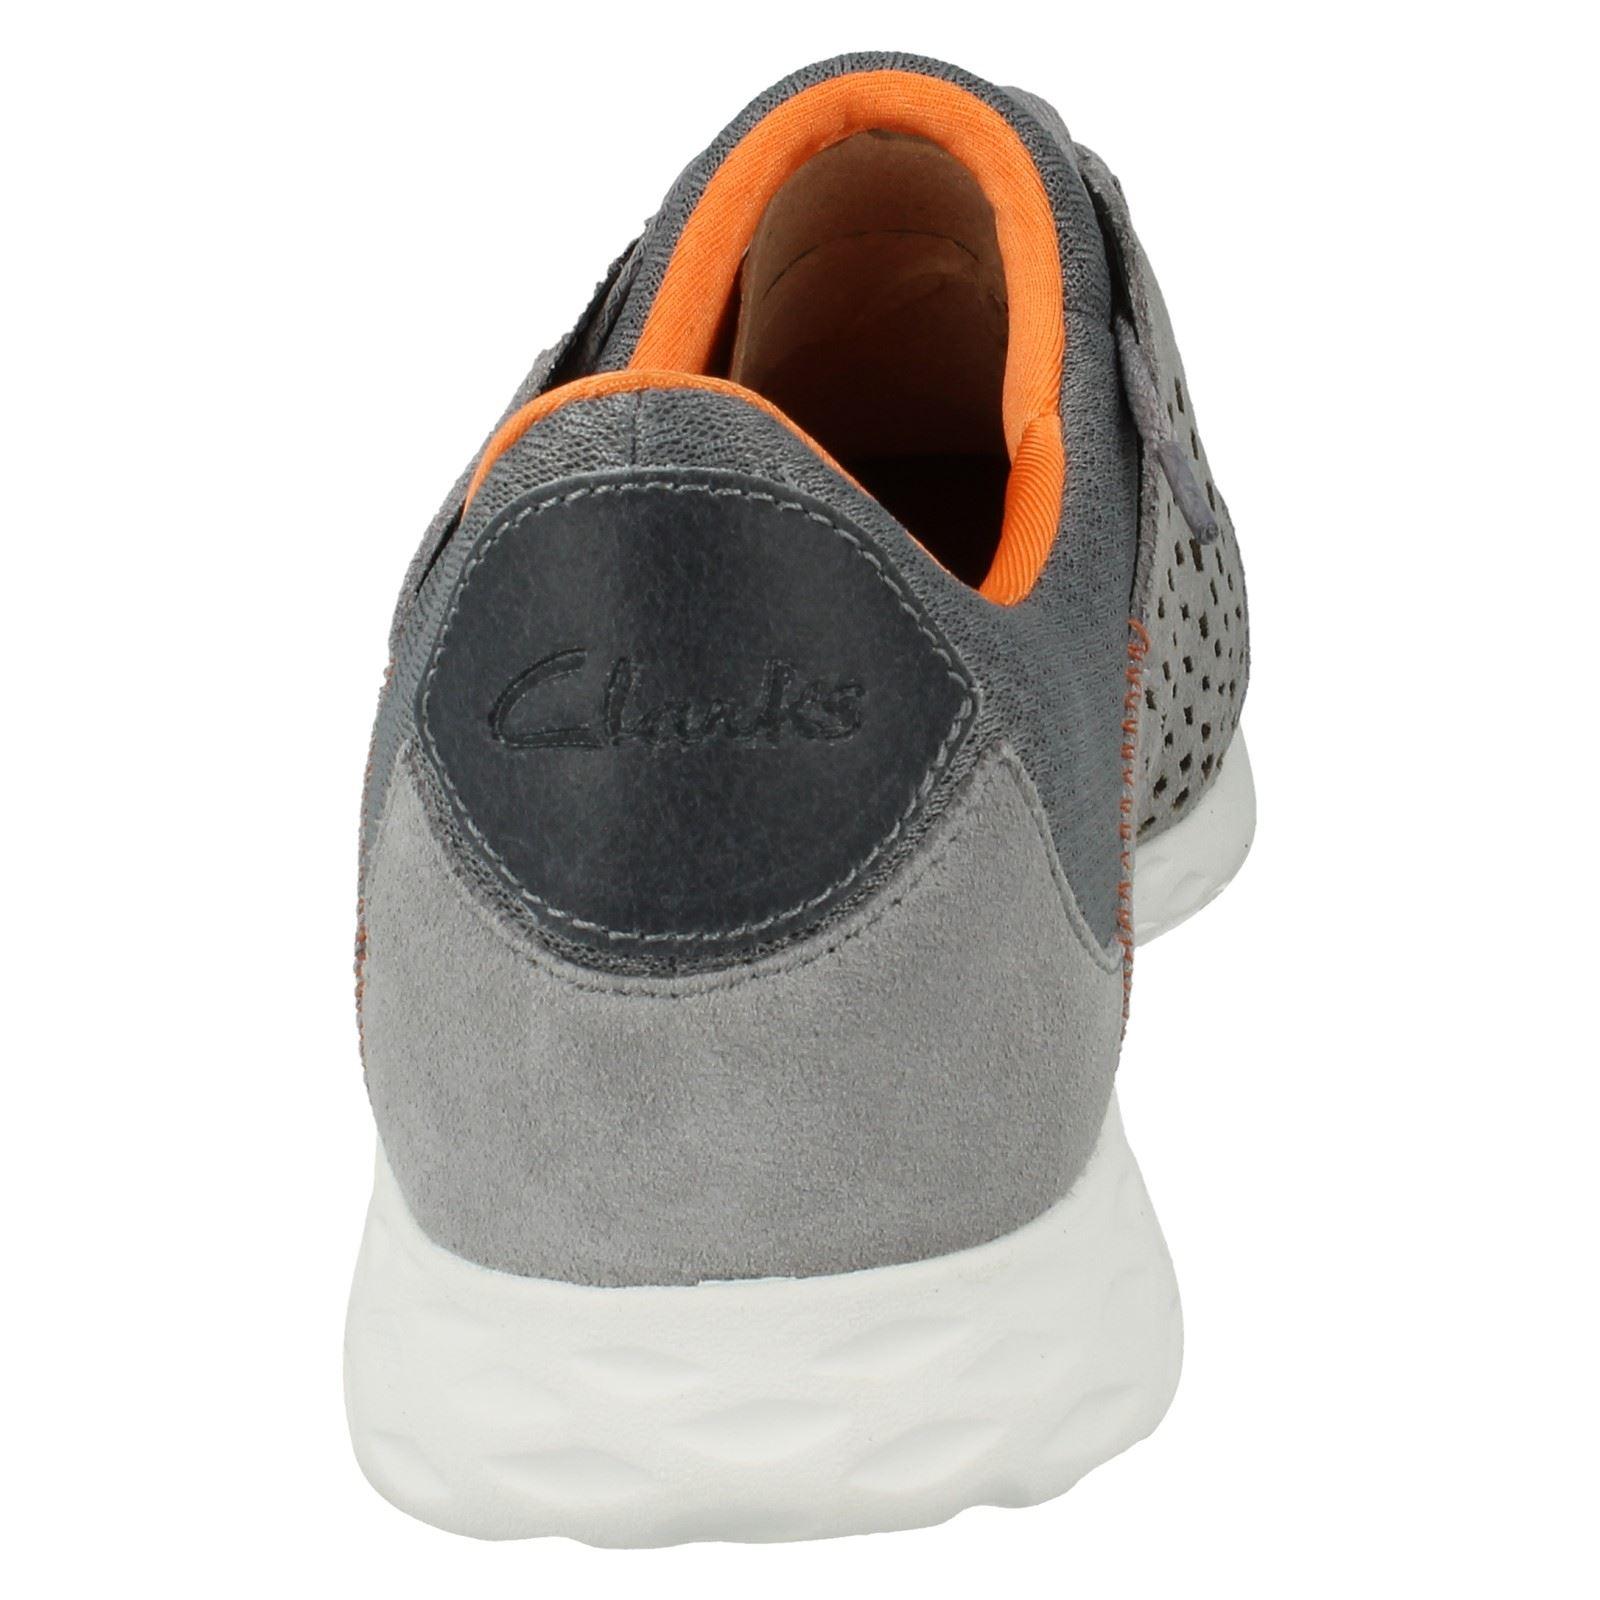 Men's Label Clarks Trainer Casual Sheos Label Men's - Seremax Lace 71a030